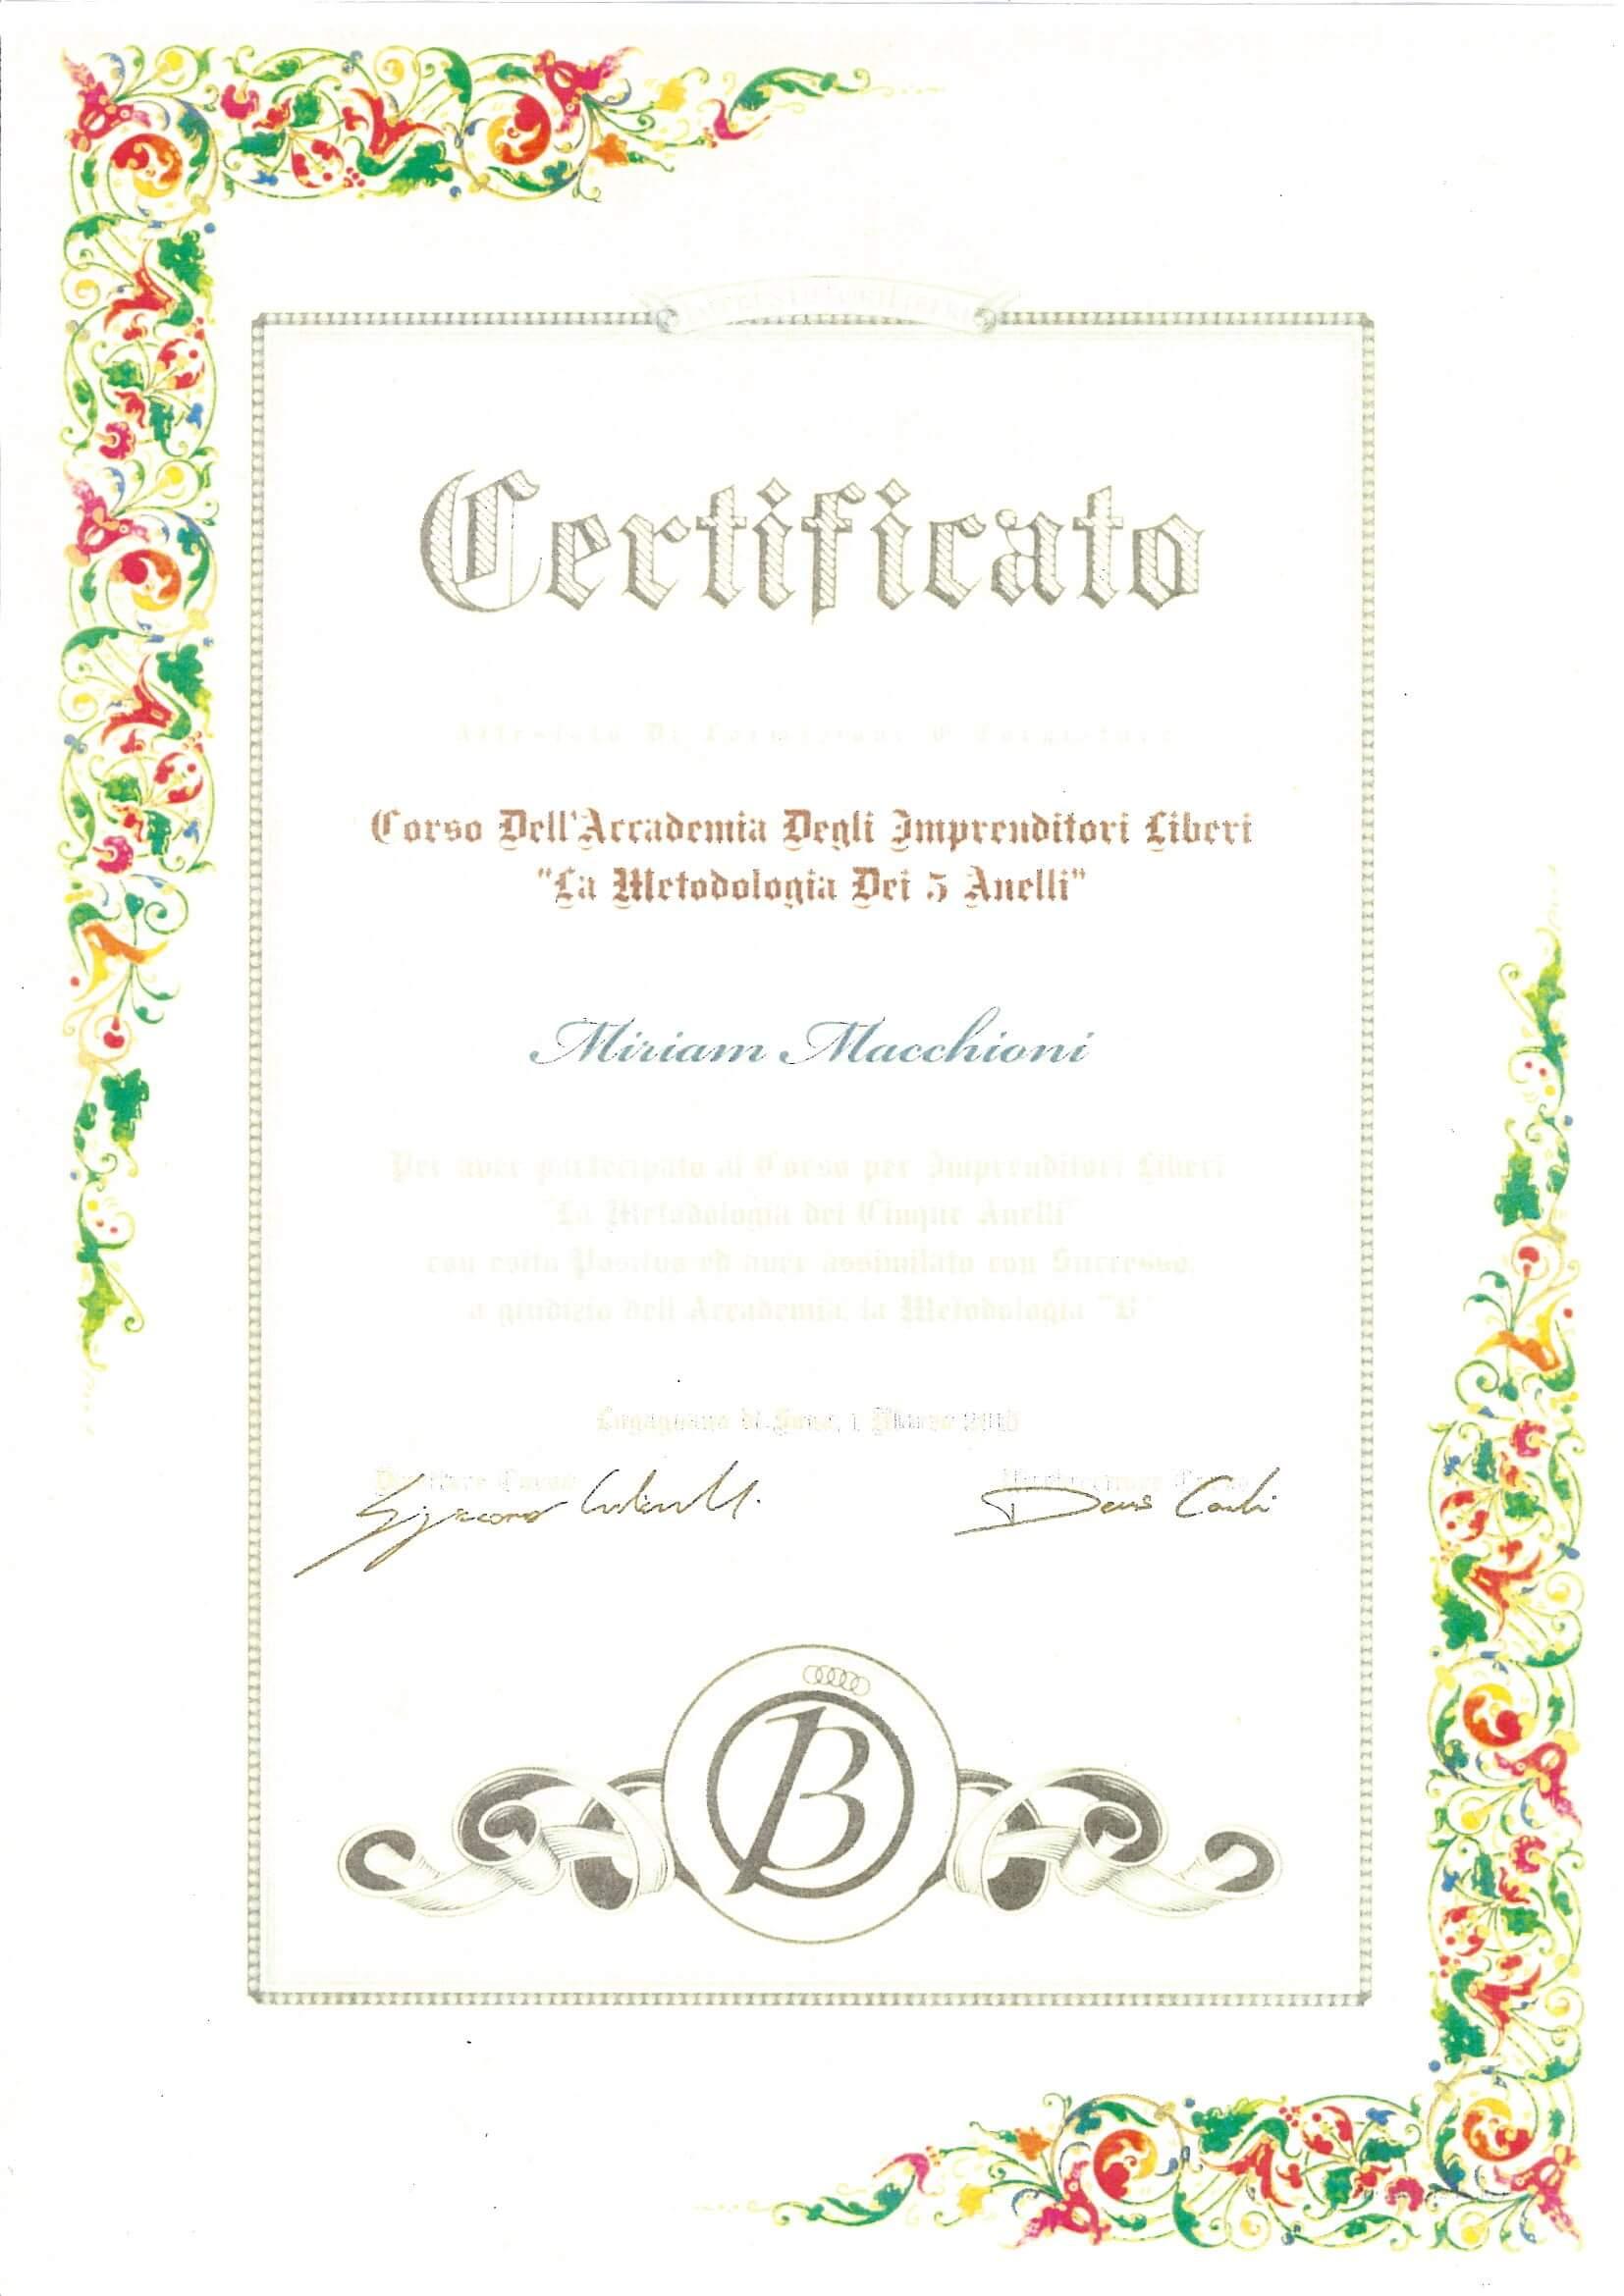 Diploma Accademia Imprenditori Liberi